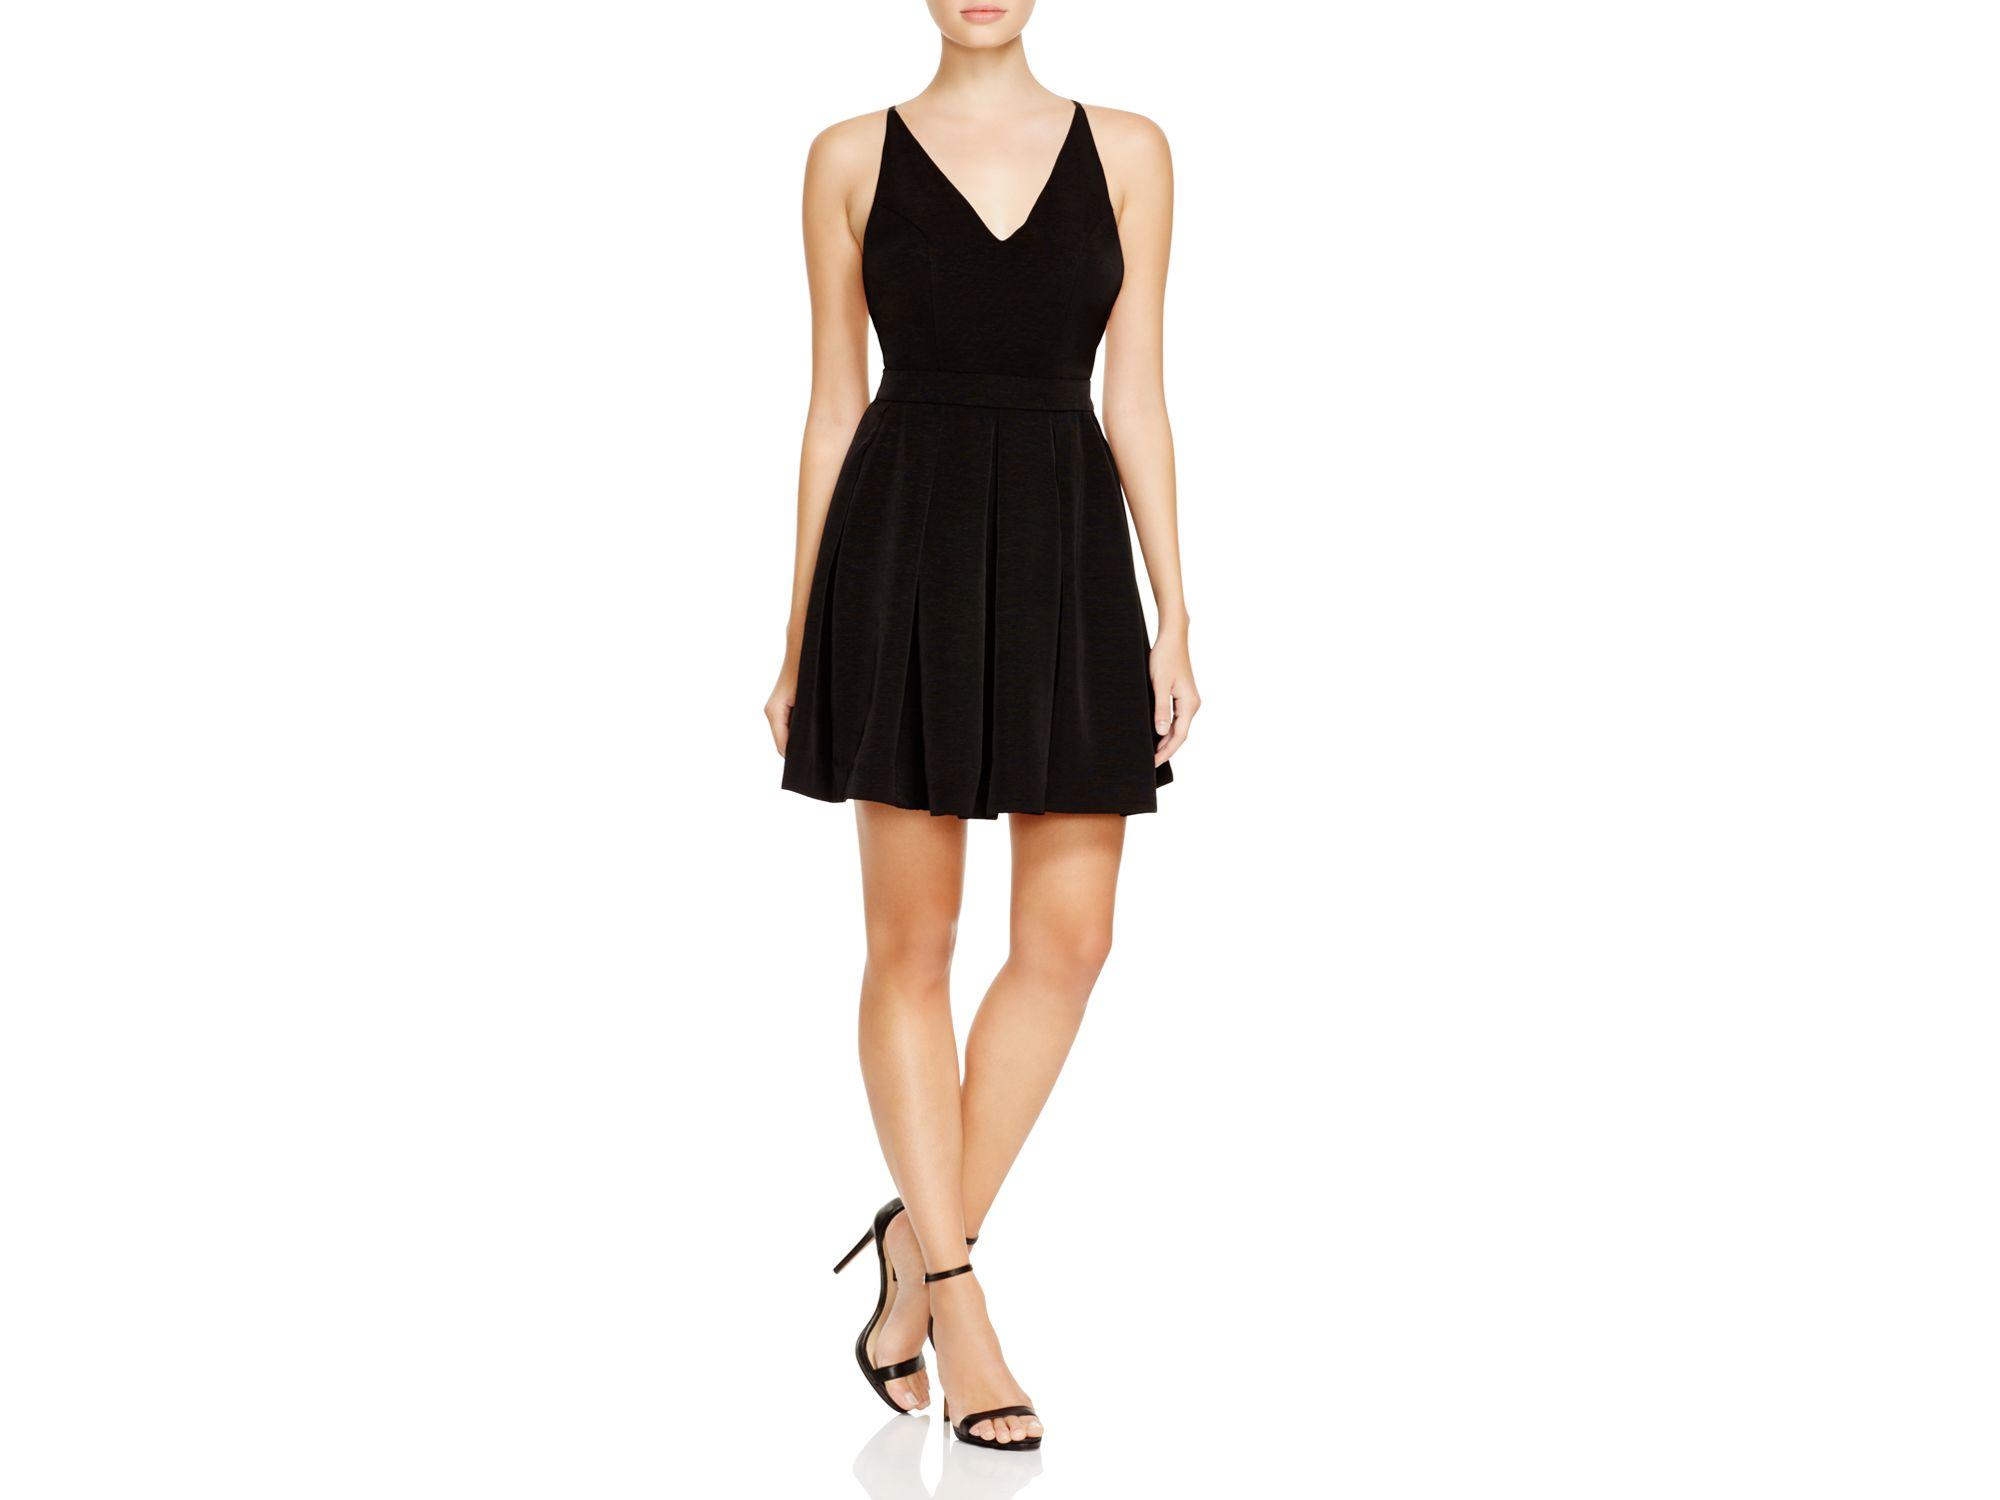 5b87508b40 Lyst - MINKPINK V-neck Cross-back Fit And Flare Dress in Black